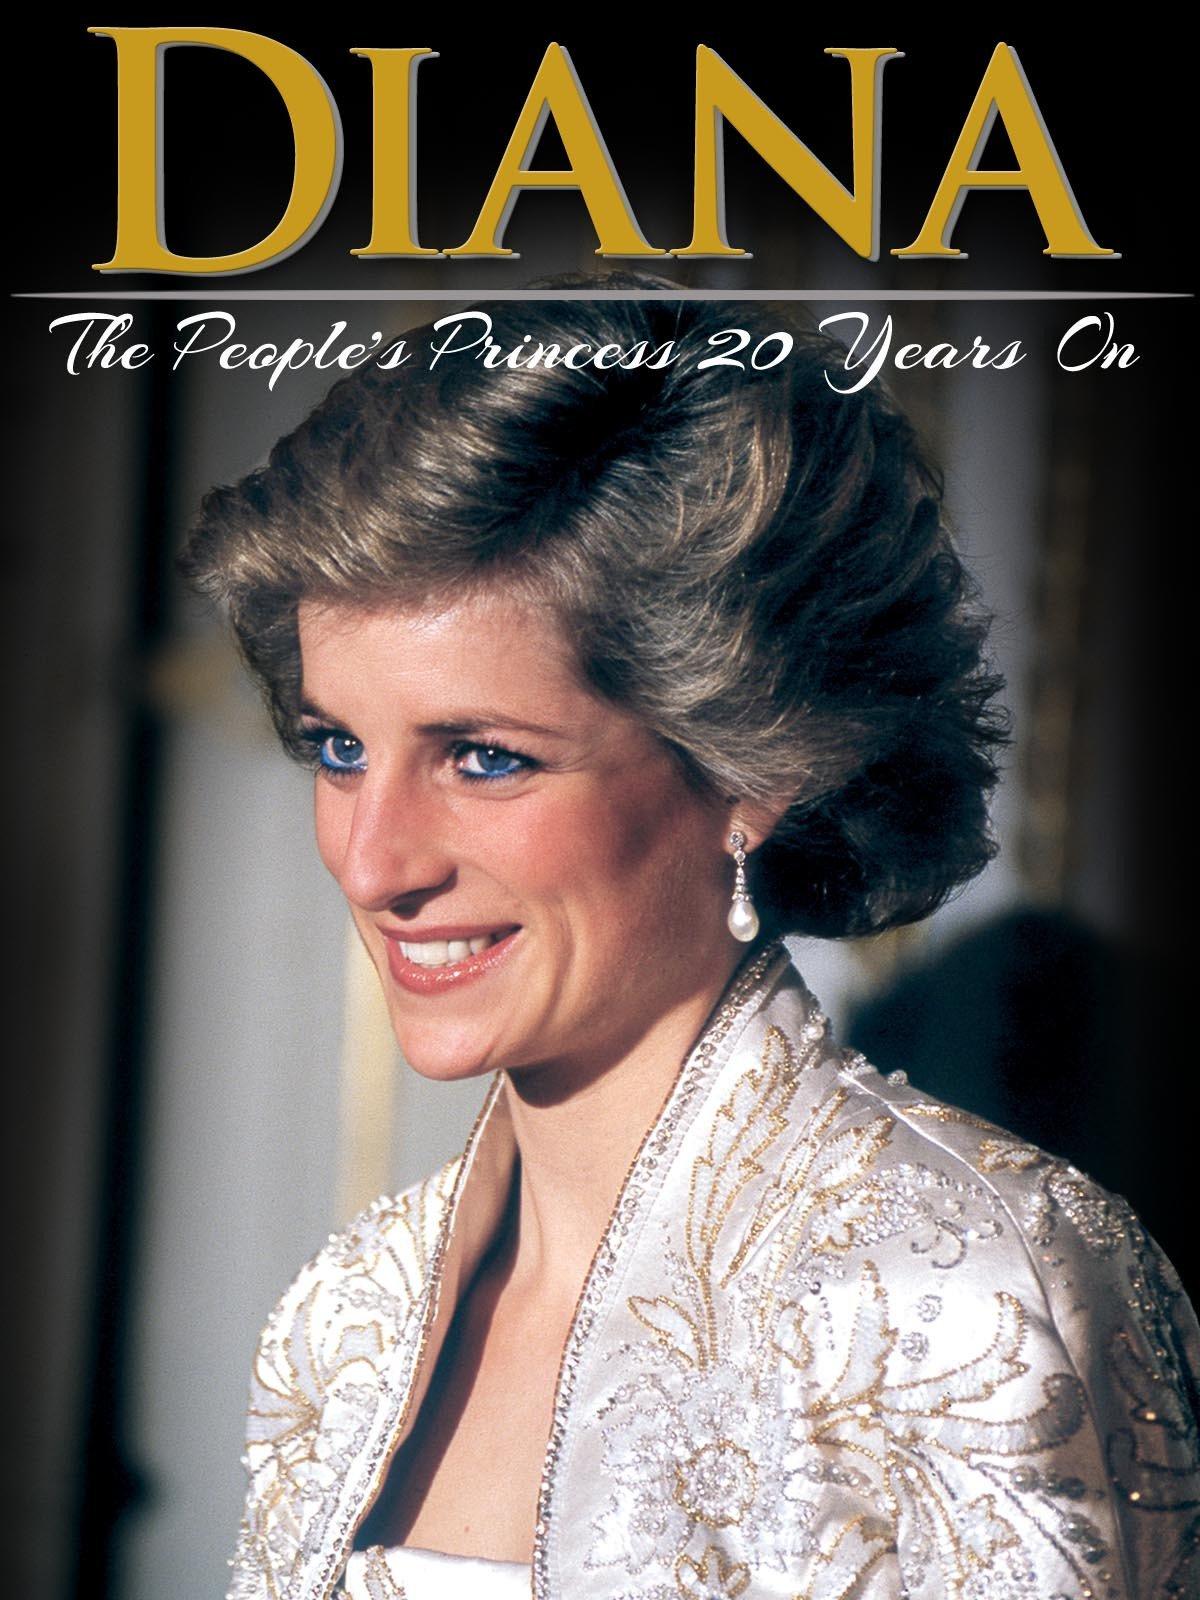 Diana: The People's Princess 20 Years On